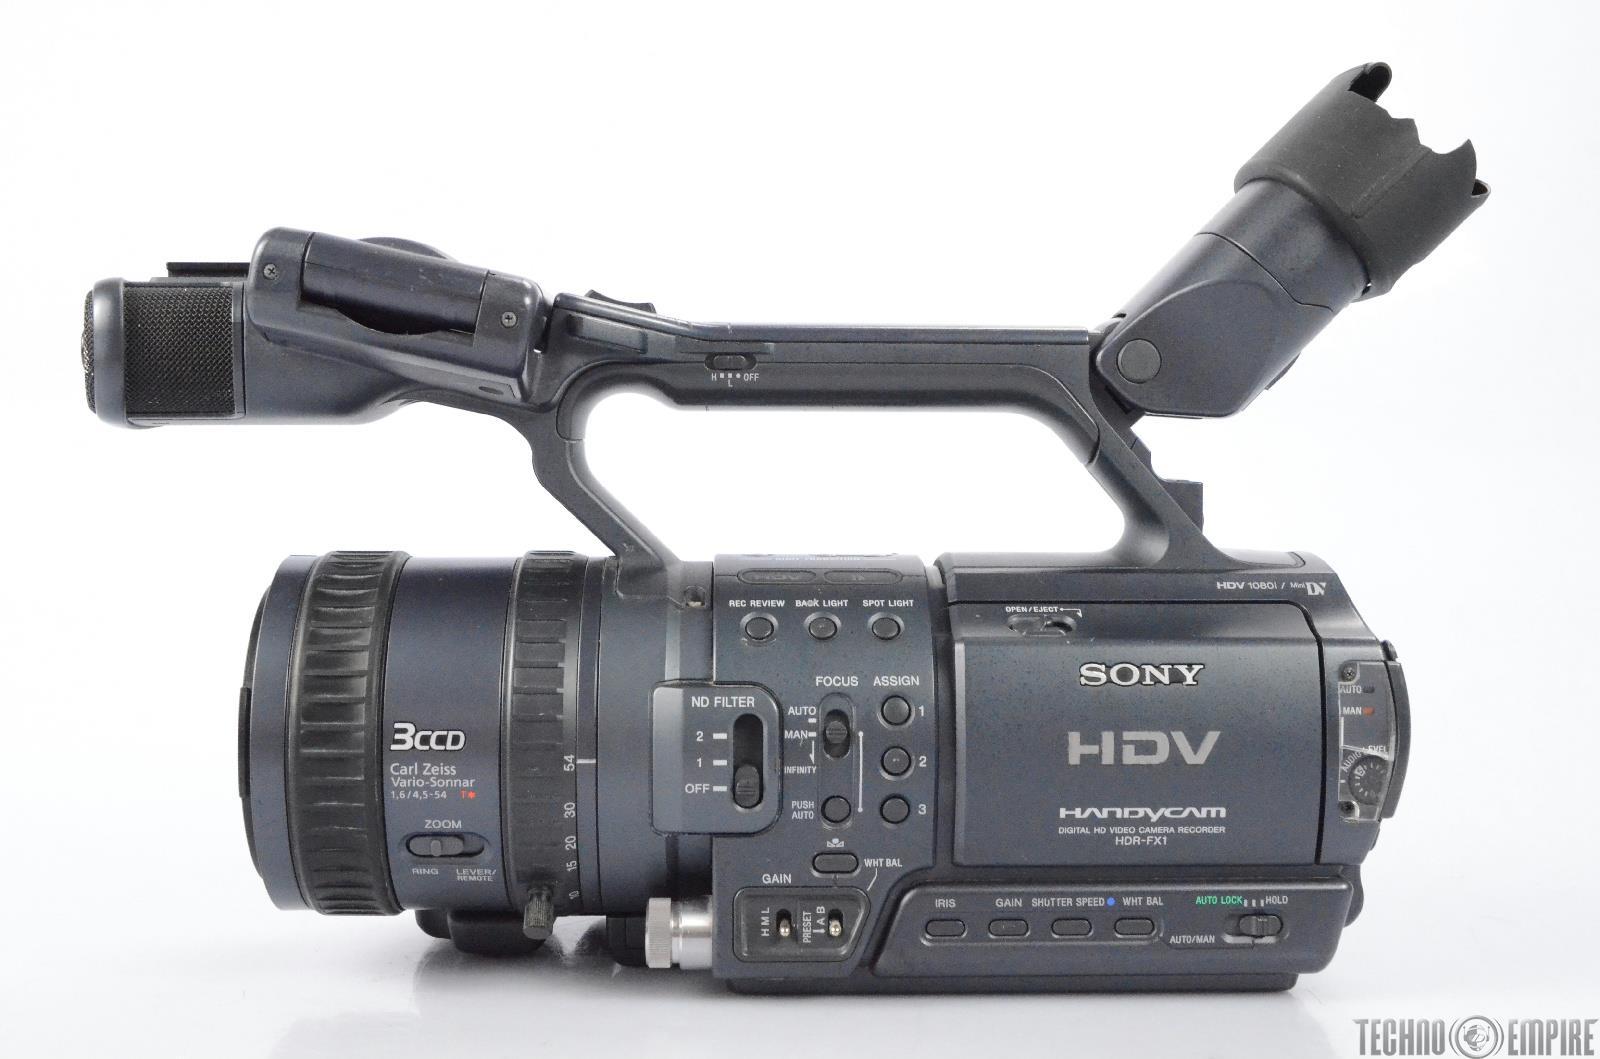 sony hdr fx1 hdv handycam digital hd video camera recorder needs rh ebay com Camcorder Sony FX 1 Videocamaras Sony